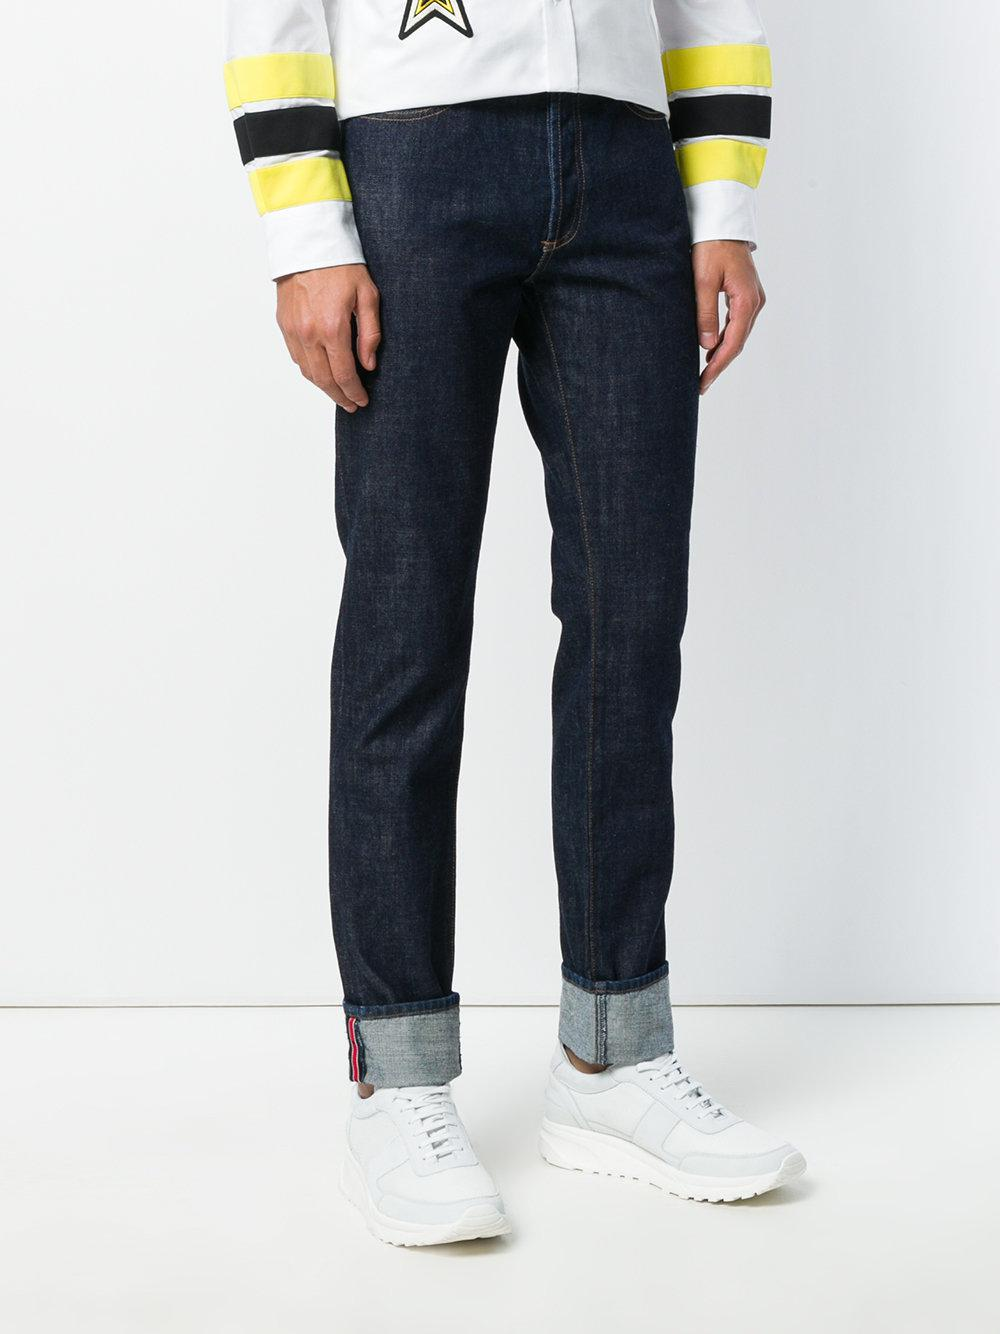 Givenchy Denim Straight Leg Jeans in Blue for Men